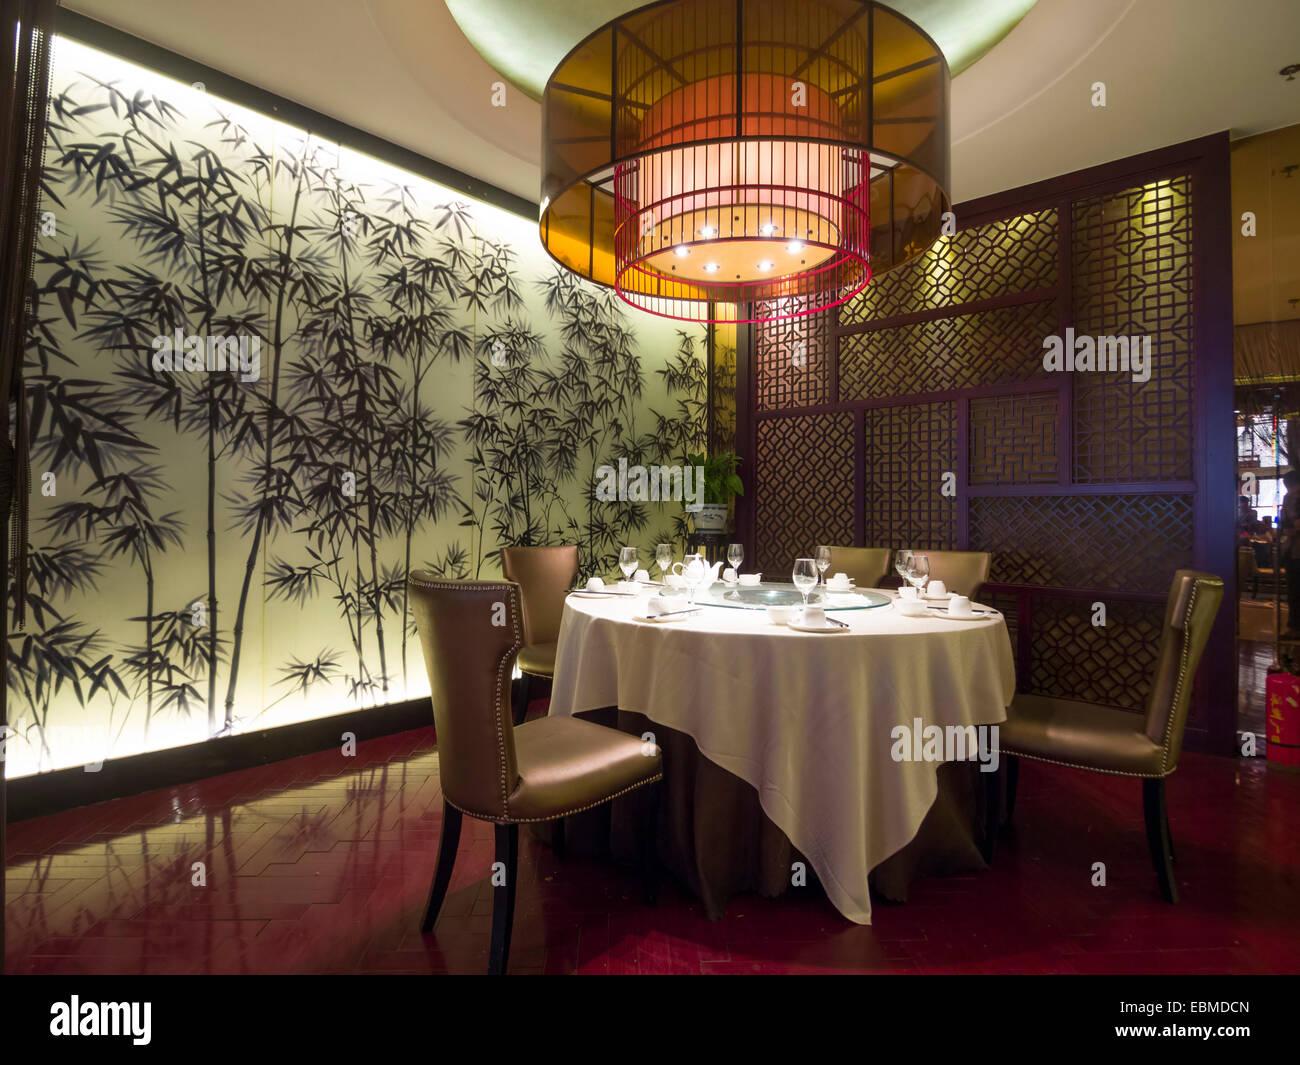 Chinese restaurant interior stock photos chinese - Chinese restaurant interior pictures ...